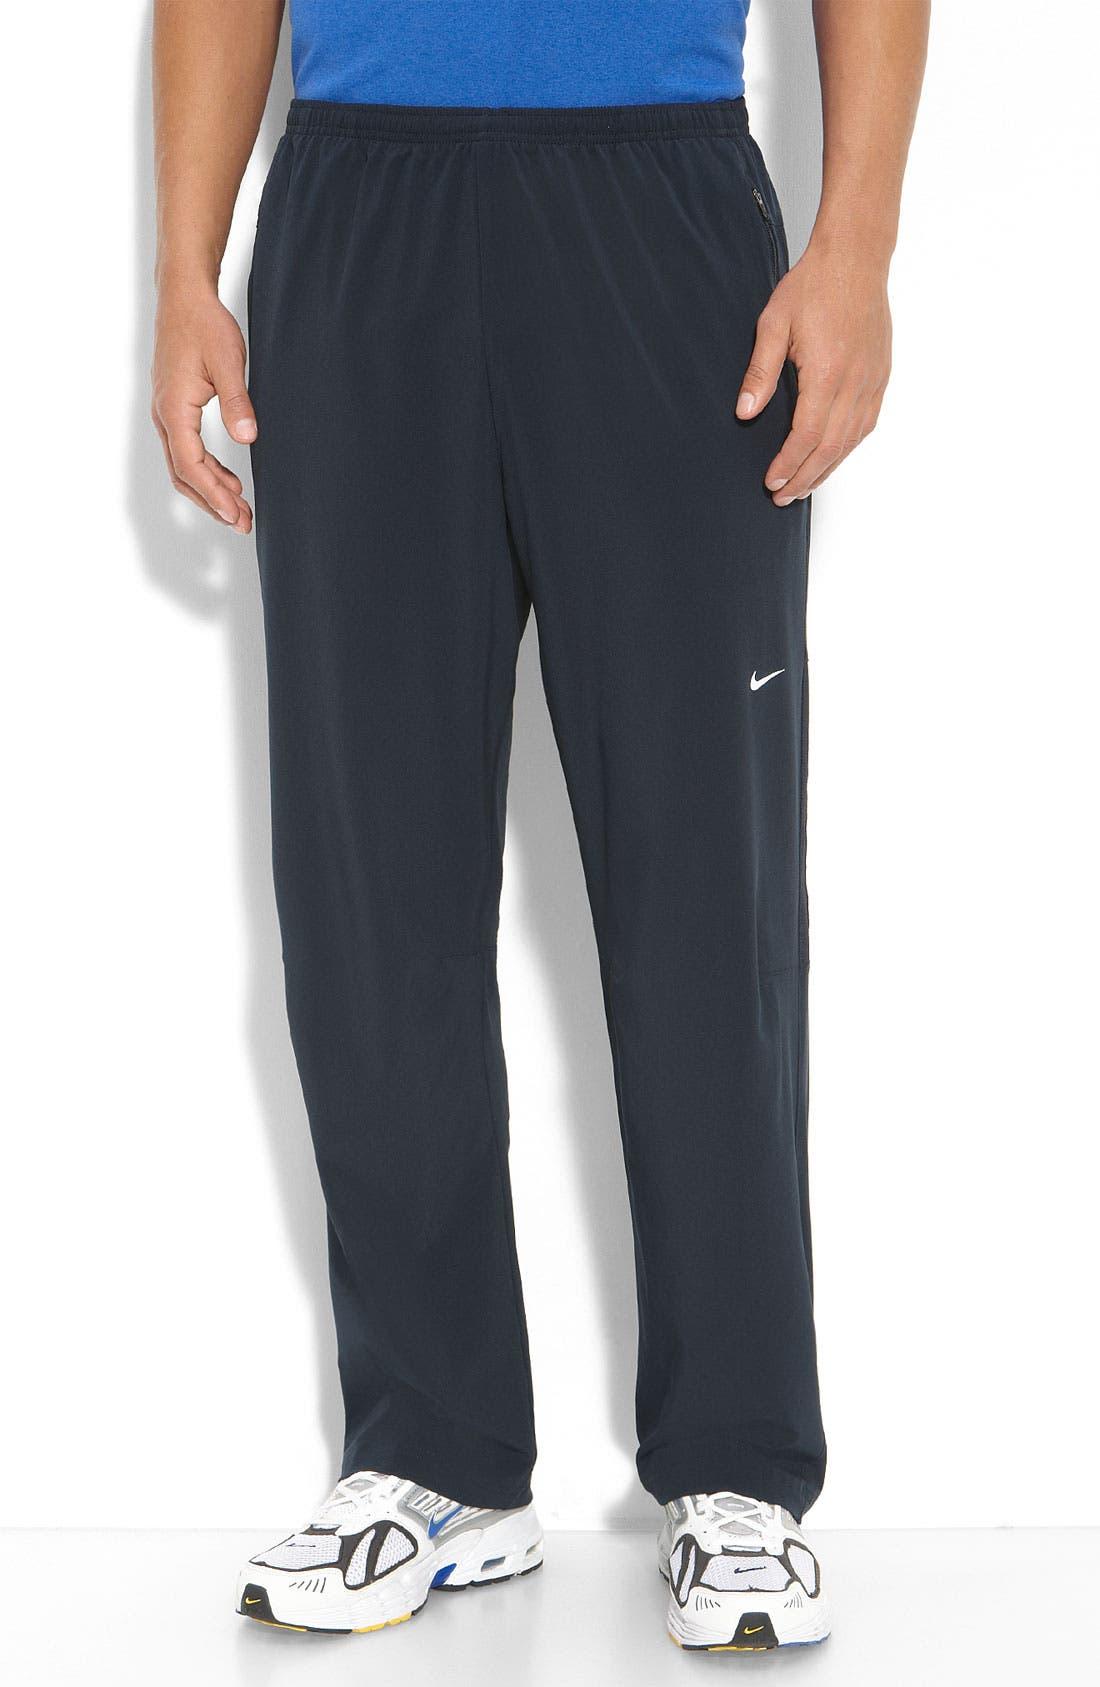 Main Image - Nike Dri-FIT Stretch Woven Pants